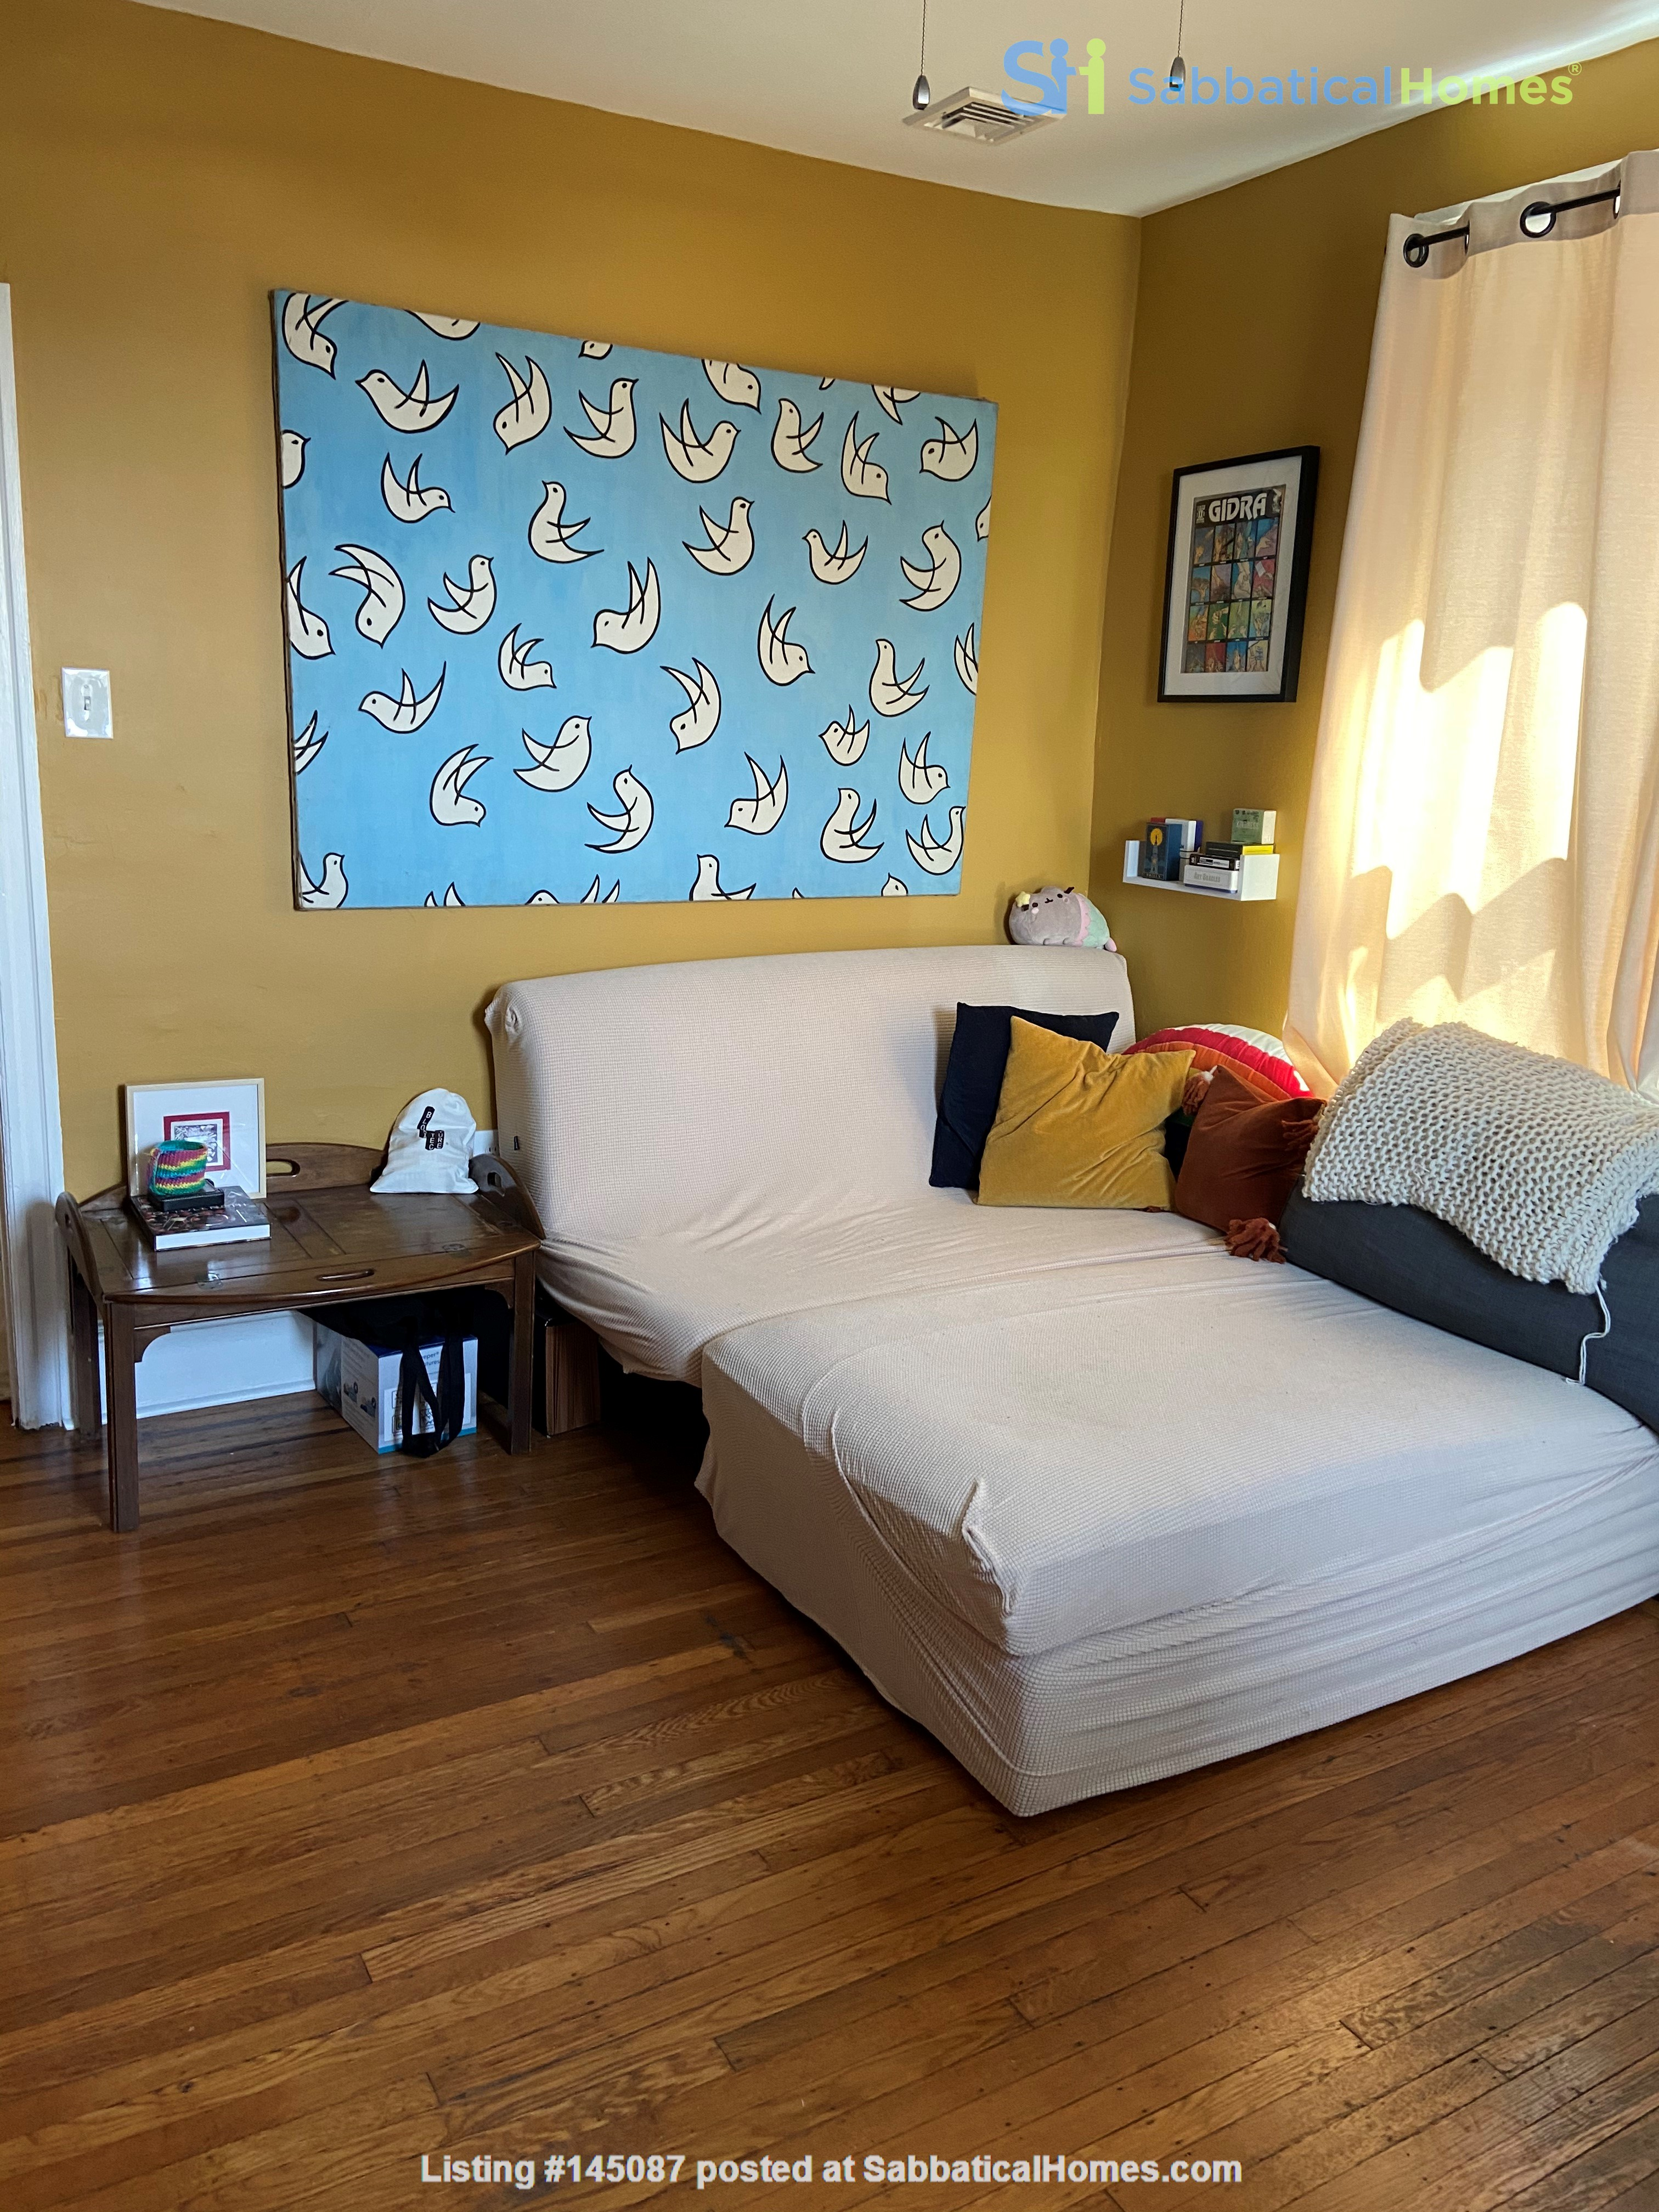 Scholars home near UPenn/Mainline colleges Home Exchange in Philadelphia, Pennsylvania, United States 5